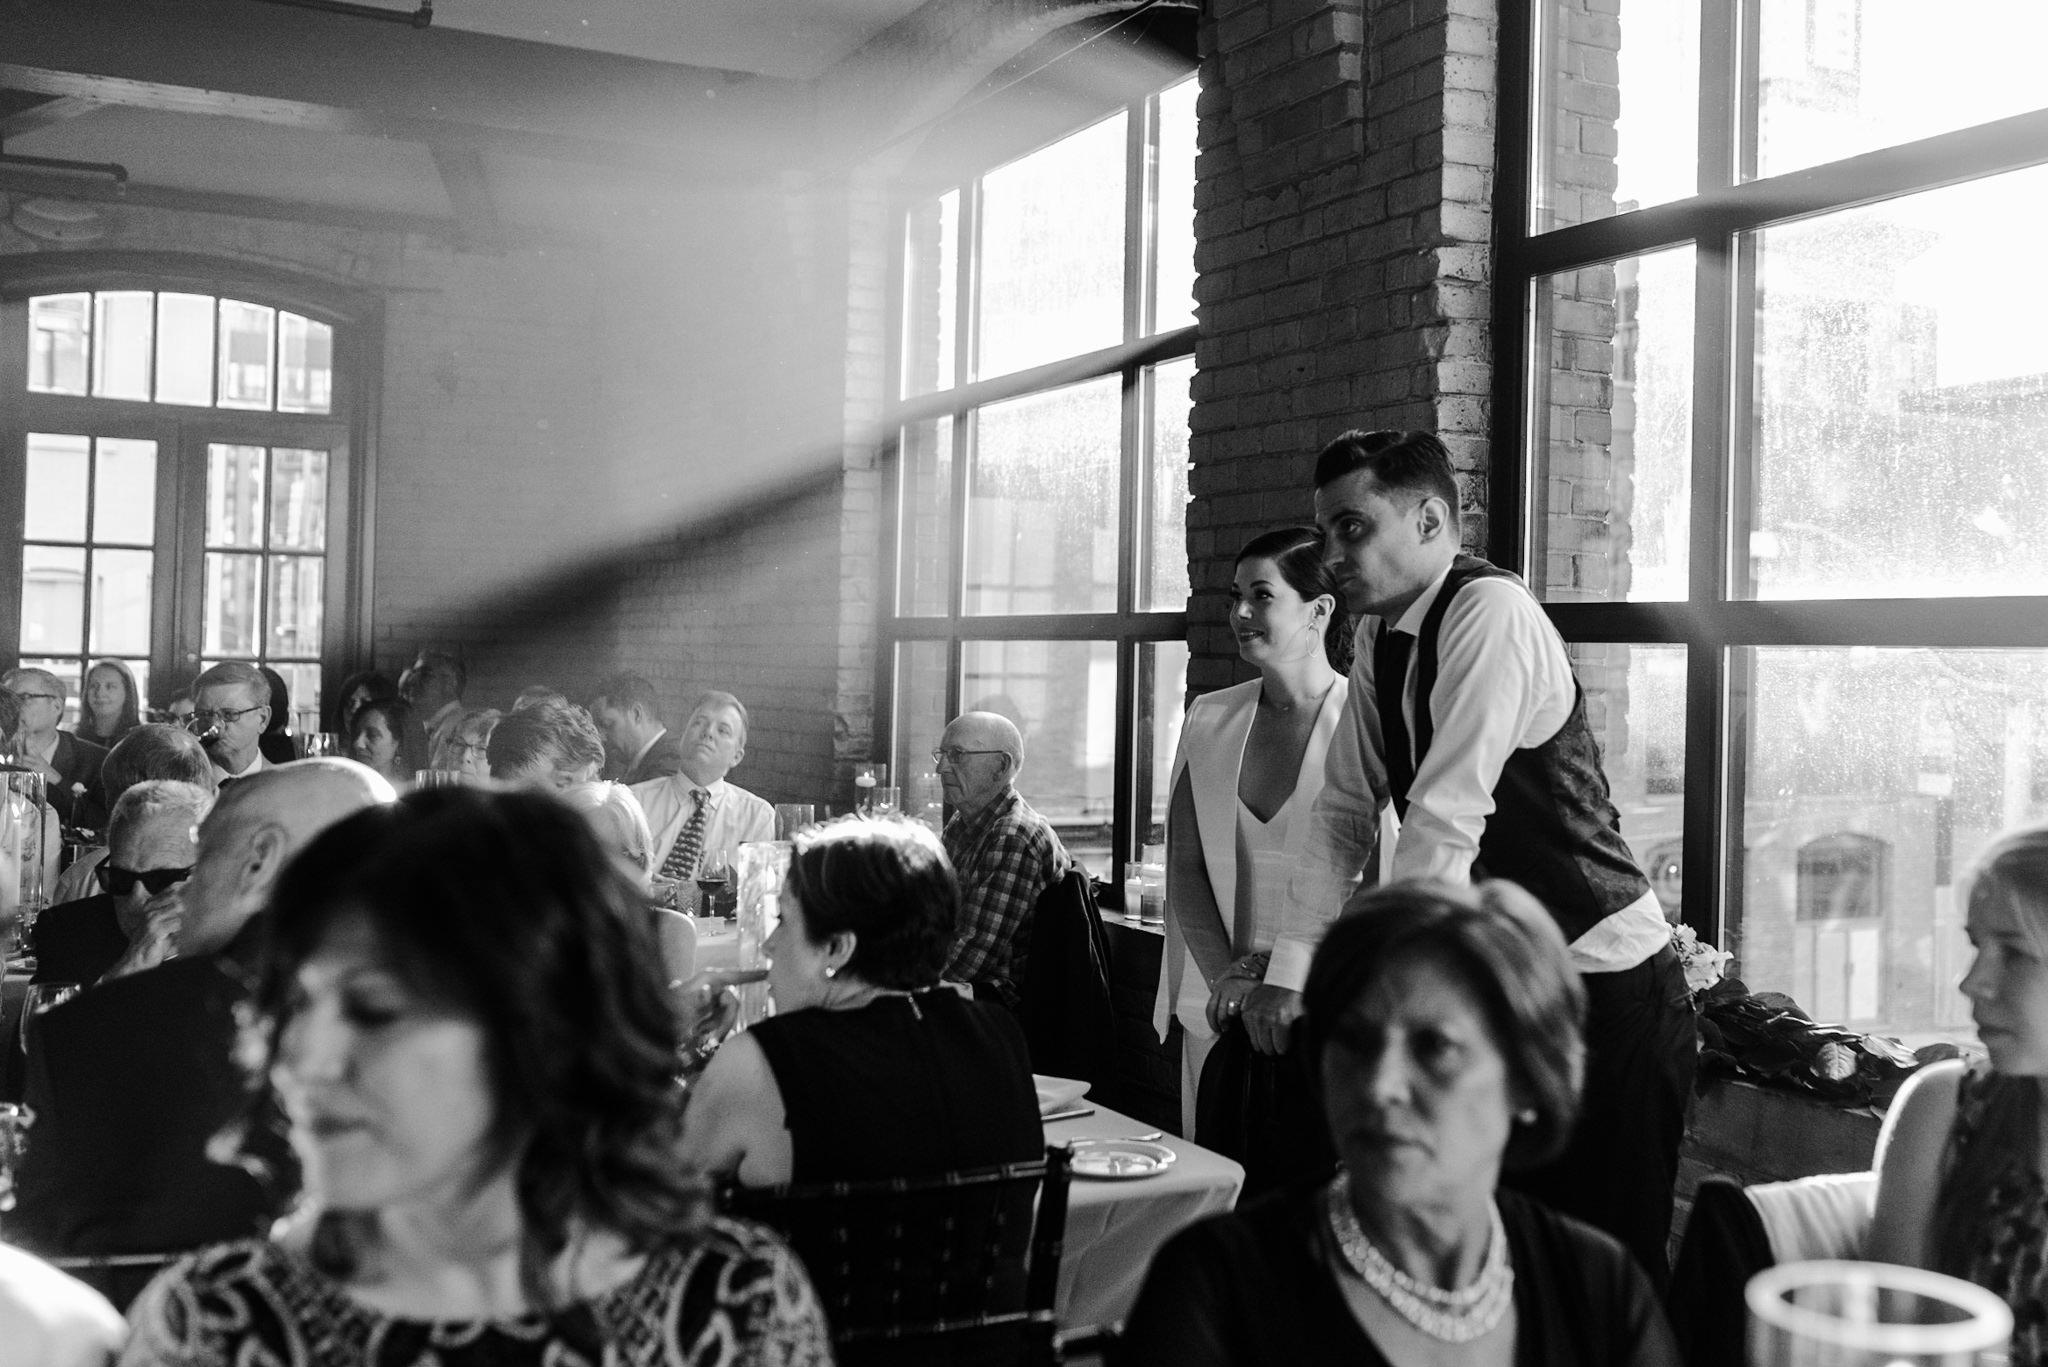 076-guests-candids-documentary-wedding-photographer-reception-storys-toronto.jpg